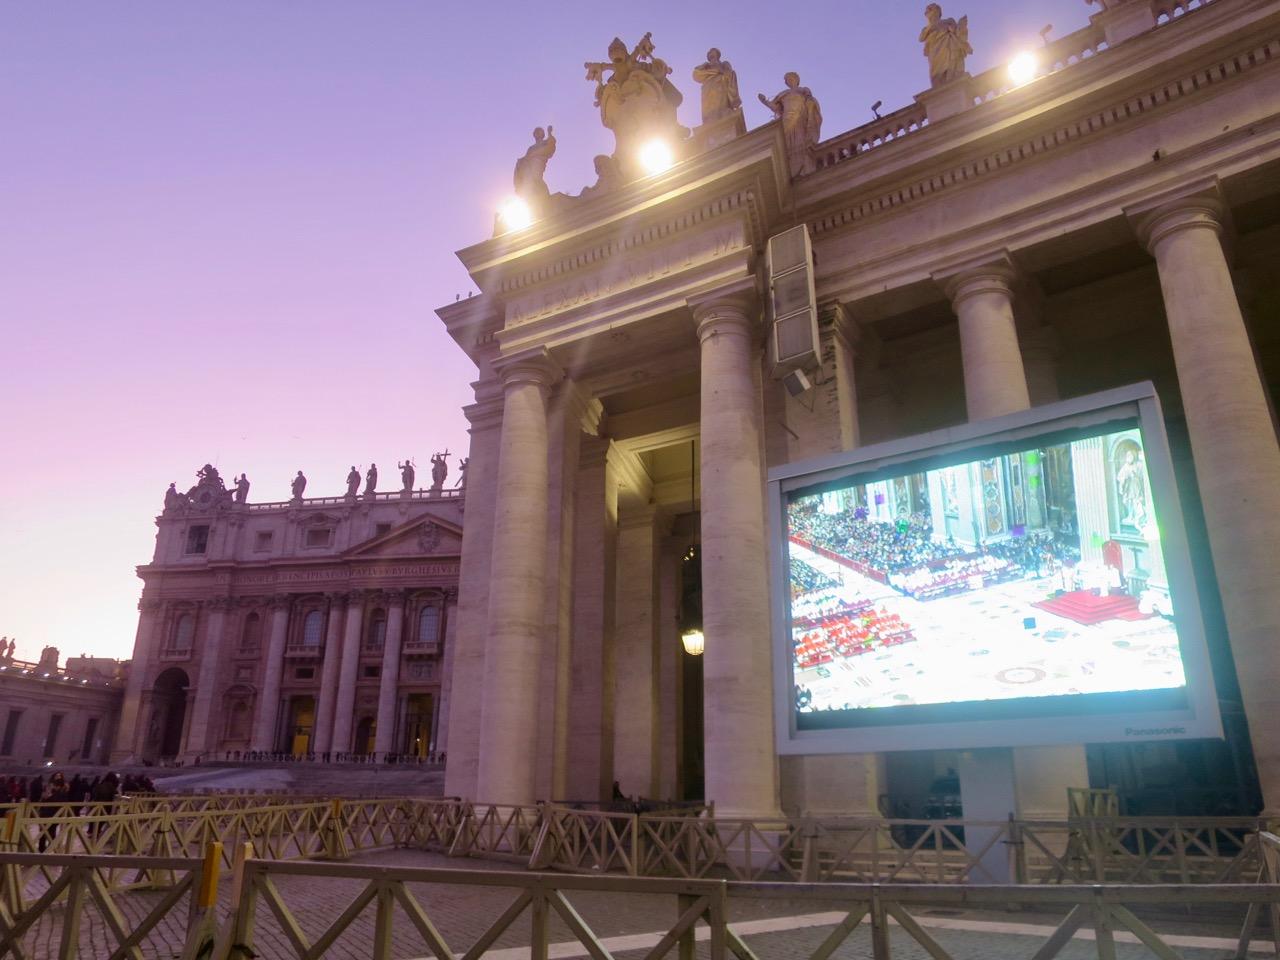 Vaticano 2 05